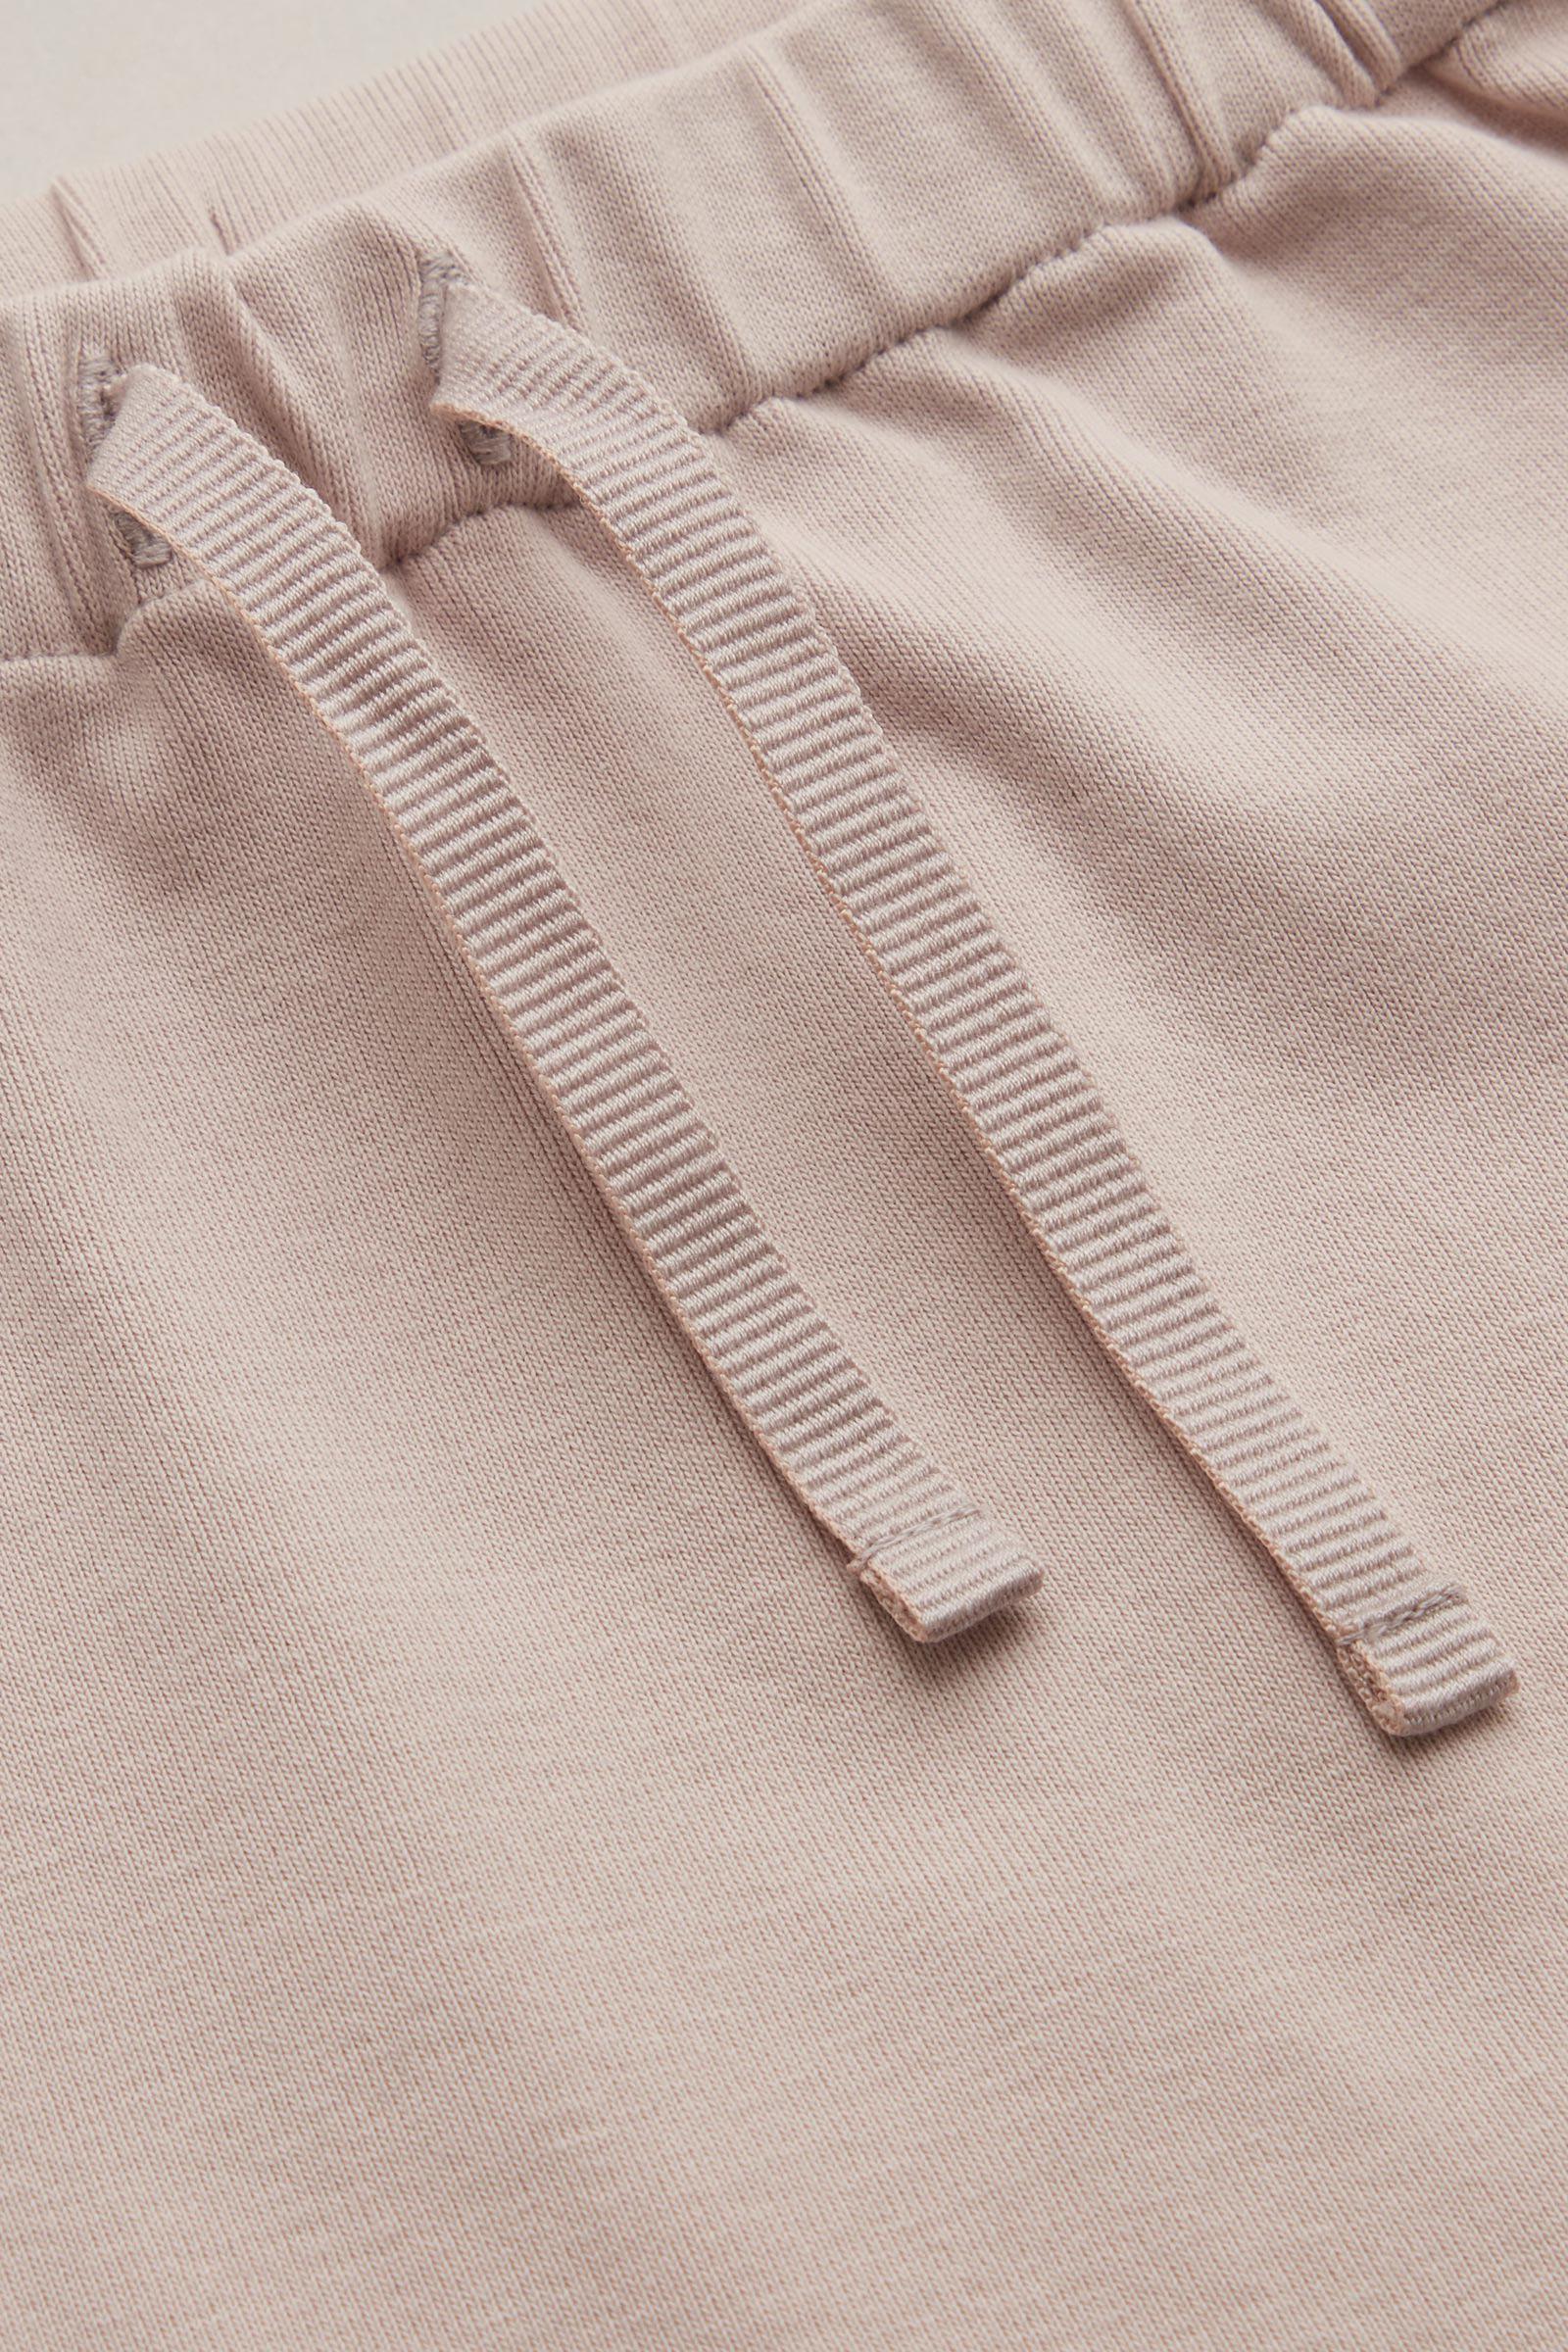 COS 치노 이펙트 트라우저의 더시티 핑크컬러 Detail입니다.